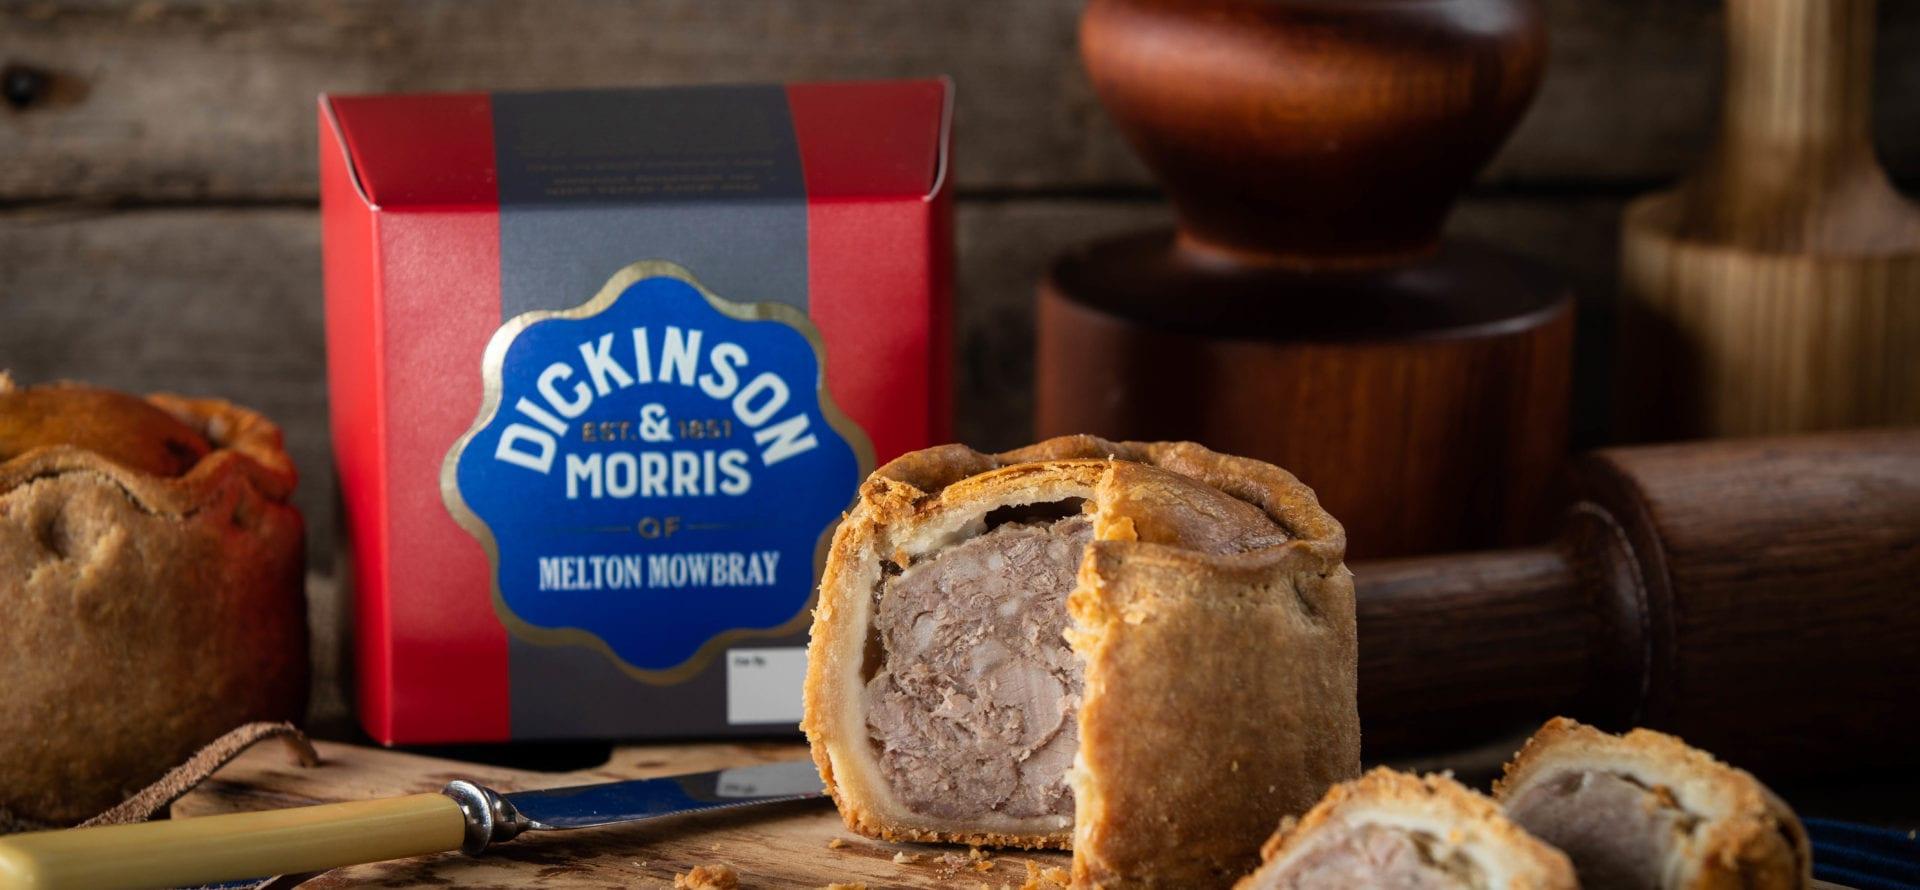 NEW Dickinson & Morris Authentic Melton Mowbray Pork pie ...